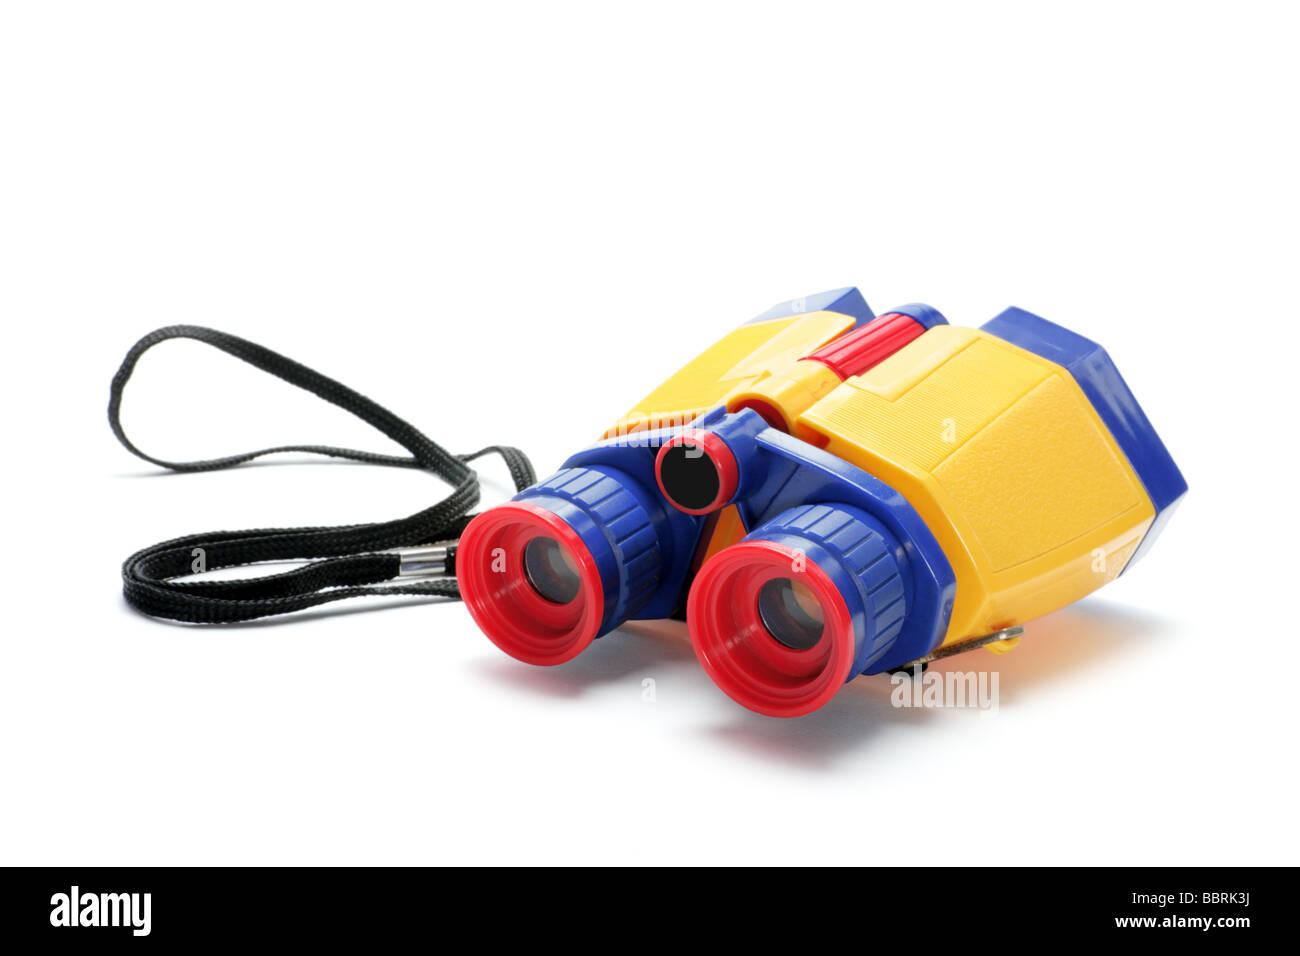 Toy Binoculars - Stock Image